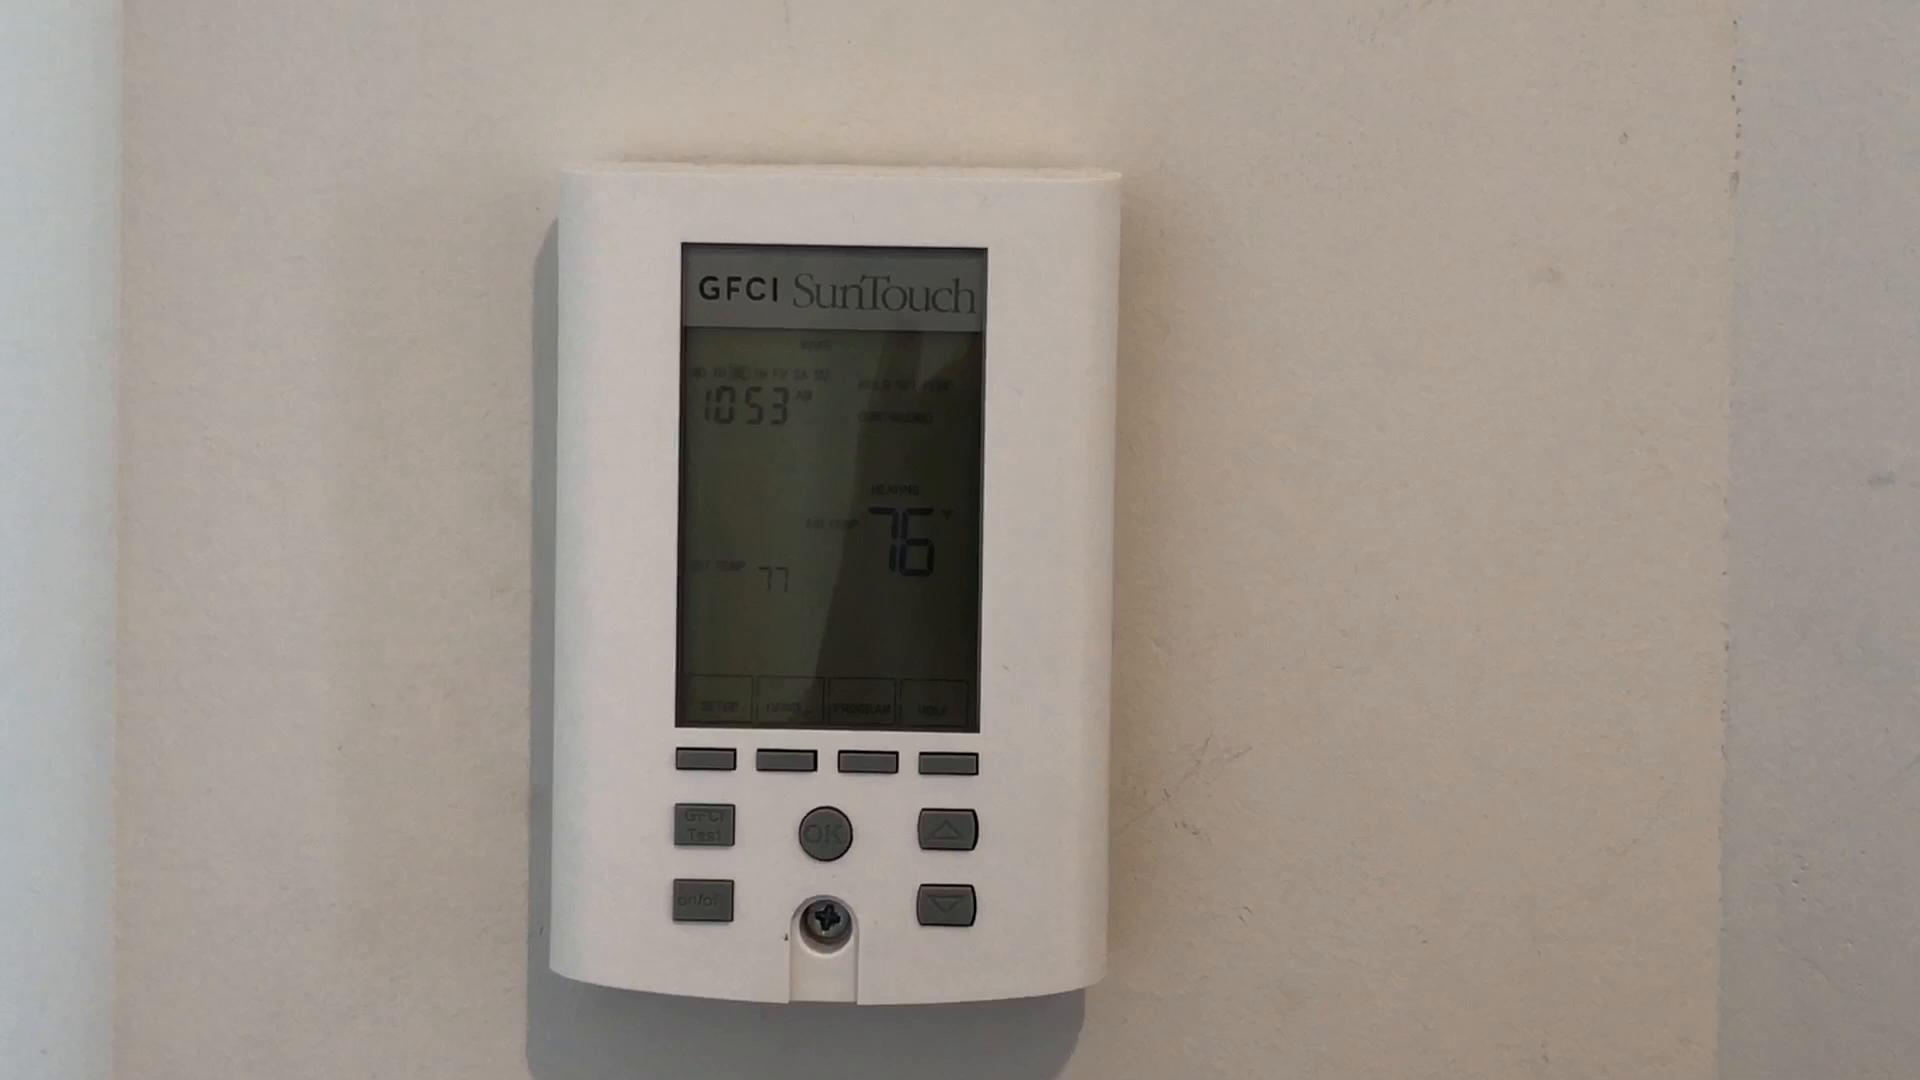 No More Error 7 On Suntouch Thermostat